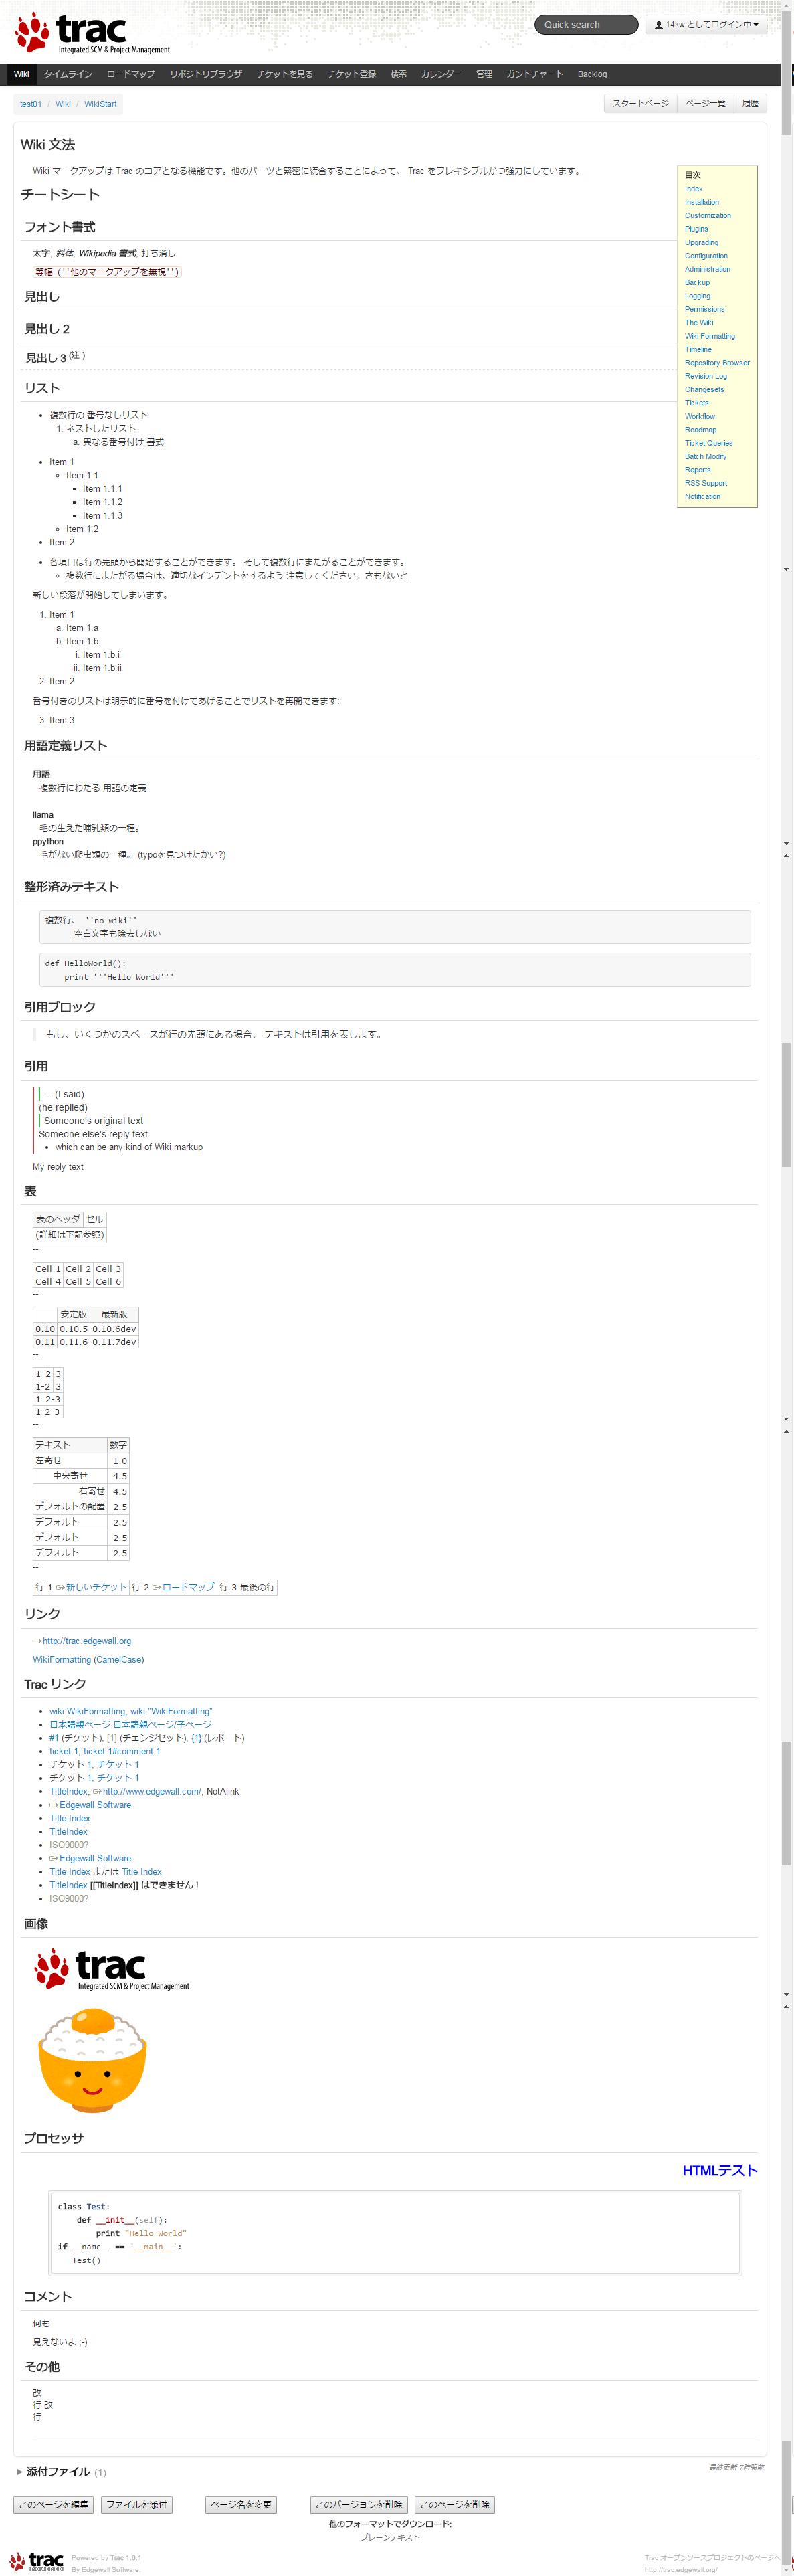 screenshot-14code.com 2016-12-07 10-05-46.png